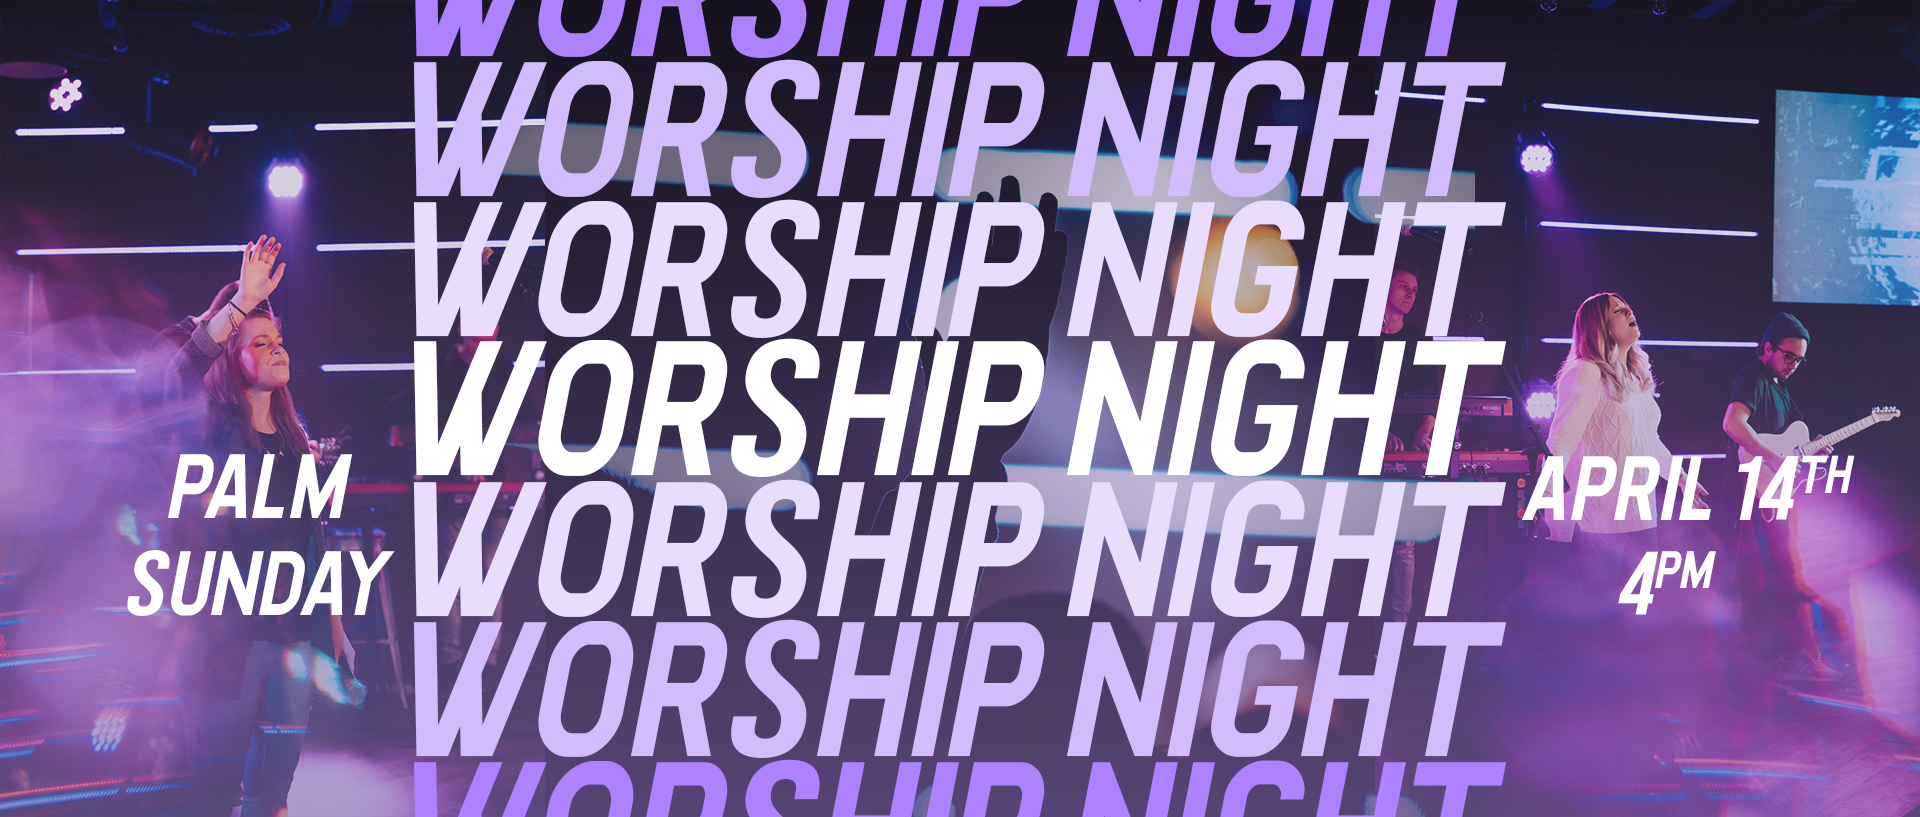 Worship Night Palm Sunday_3.png